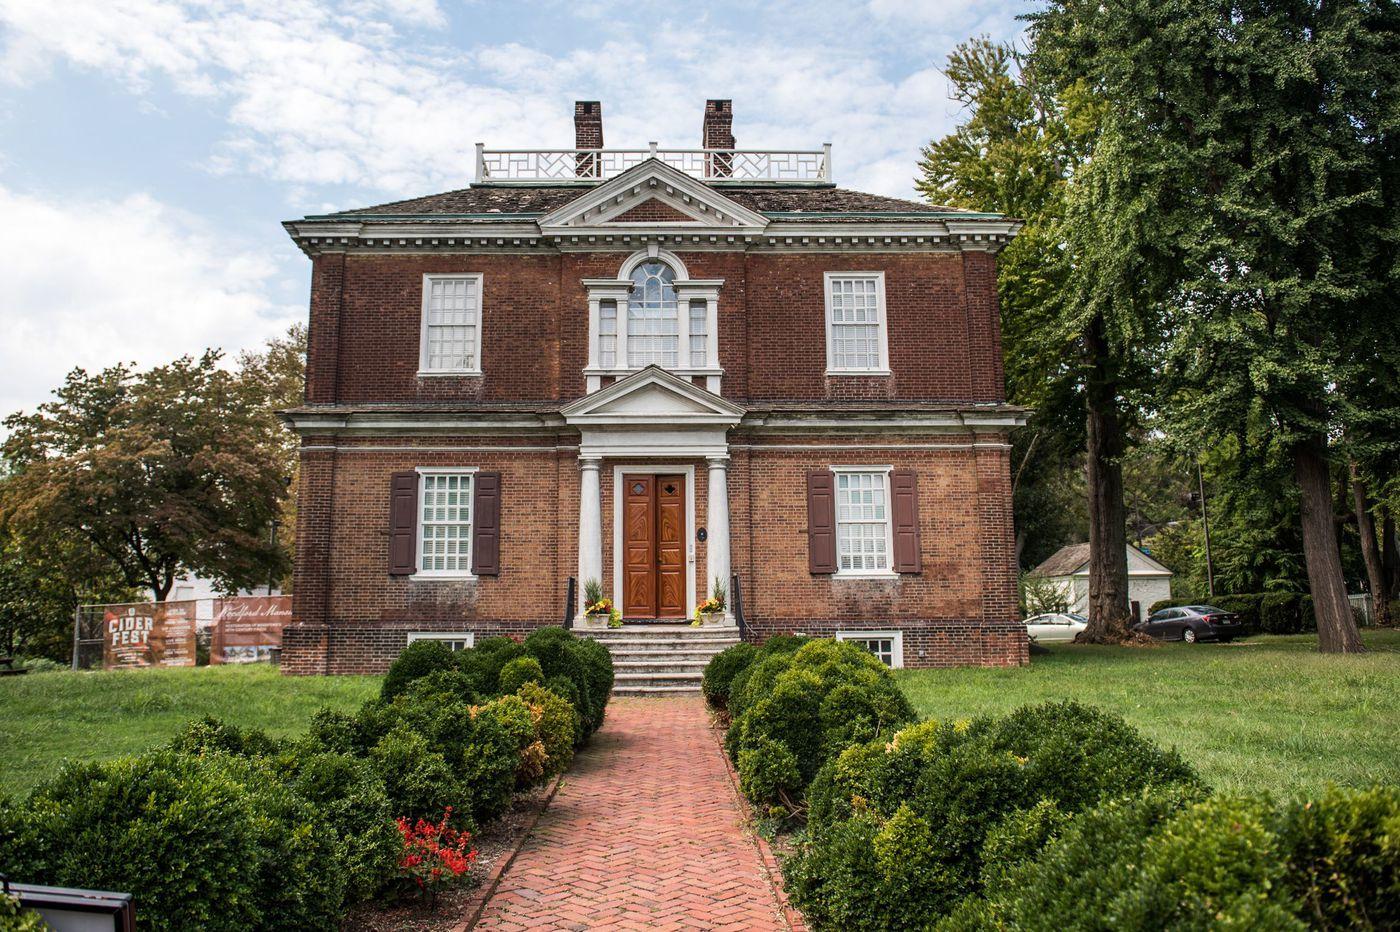 Caretaker finds body behind Fairmount Park's Woodford Mansion